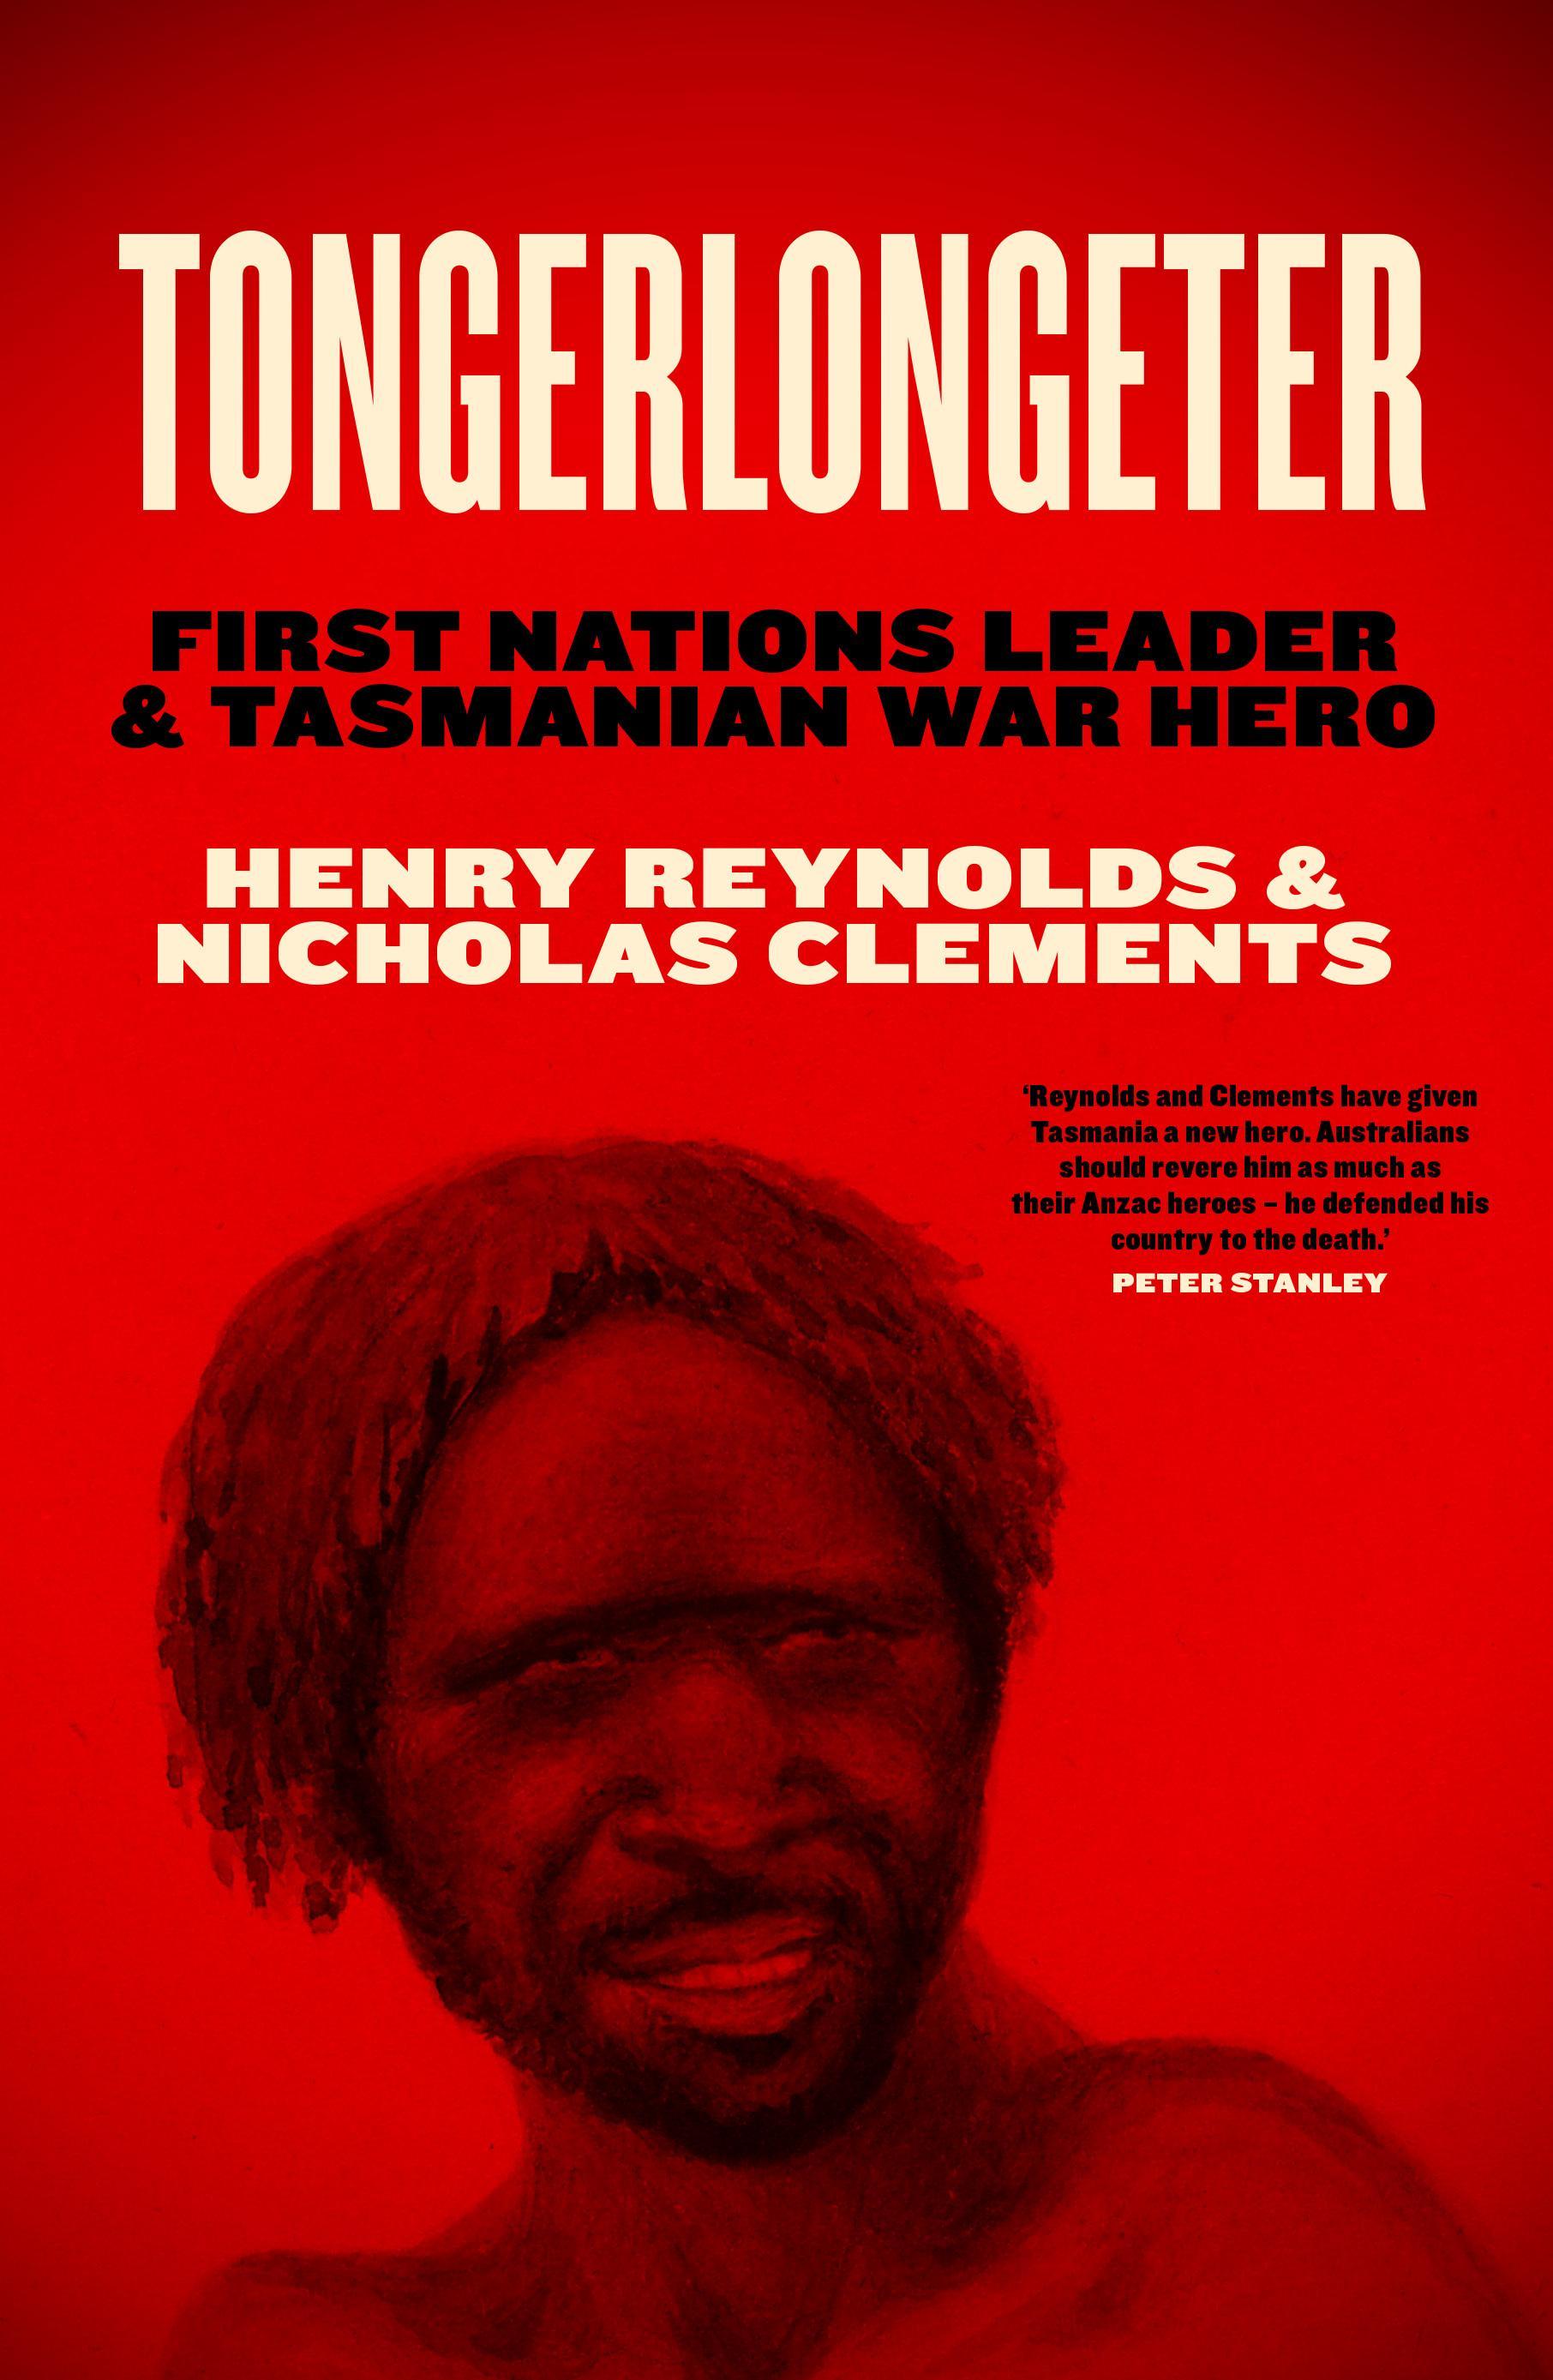 Tongerlongeter: First Nations Leader and TasmanianWarHero